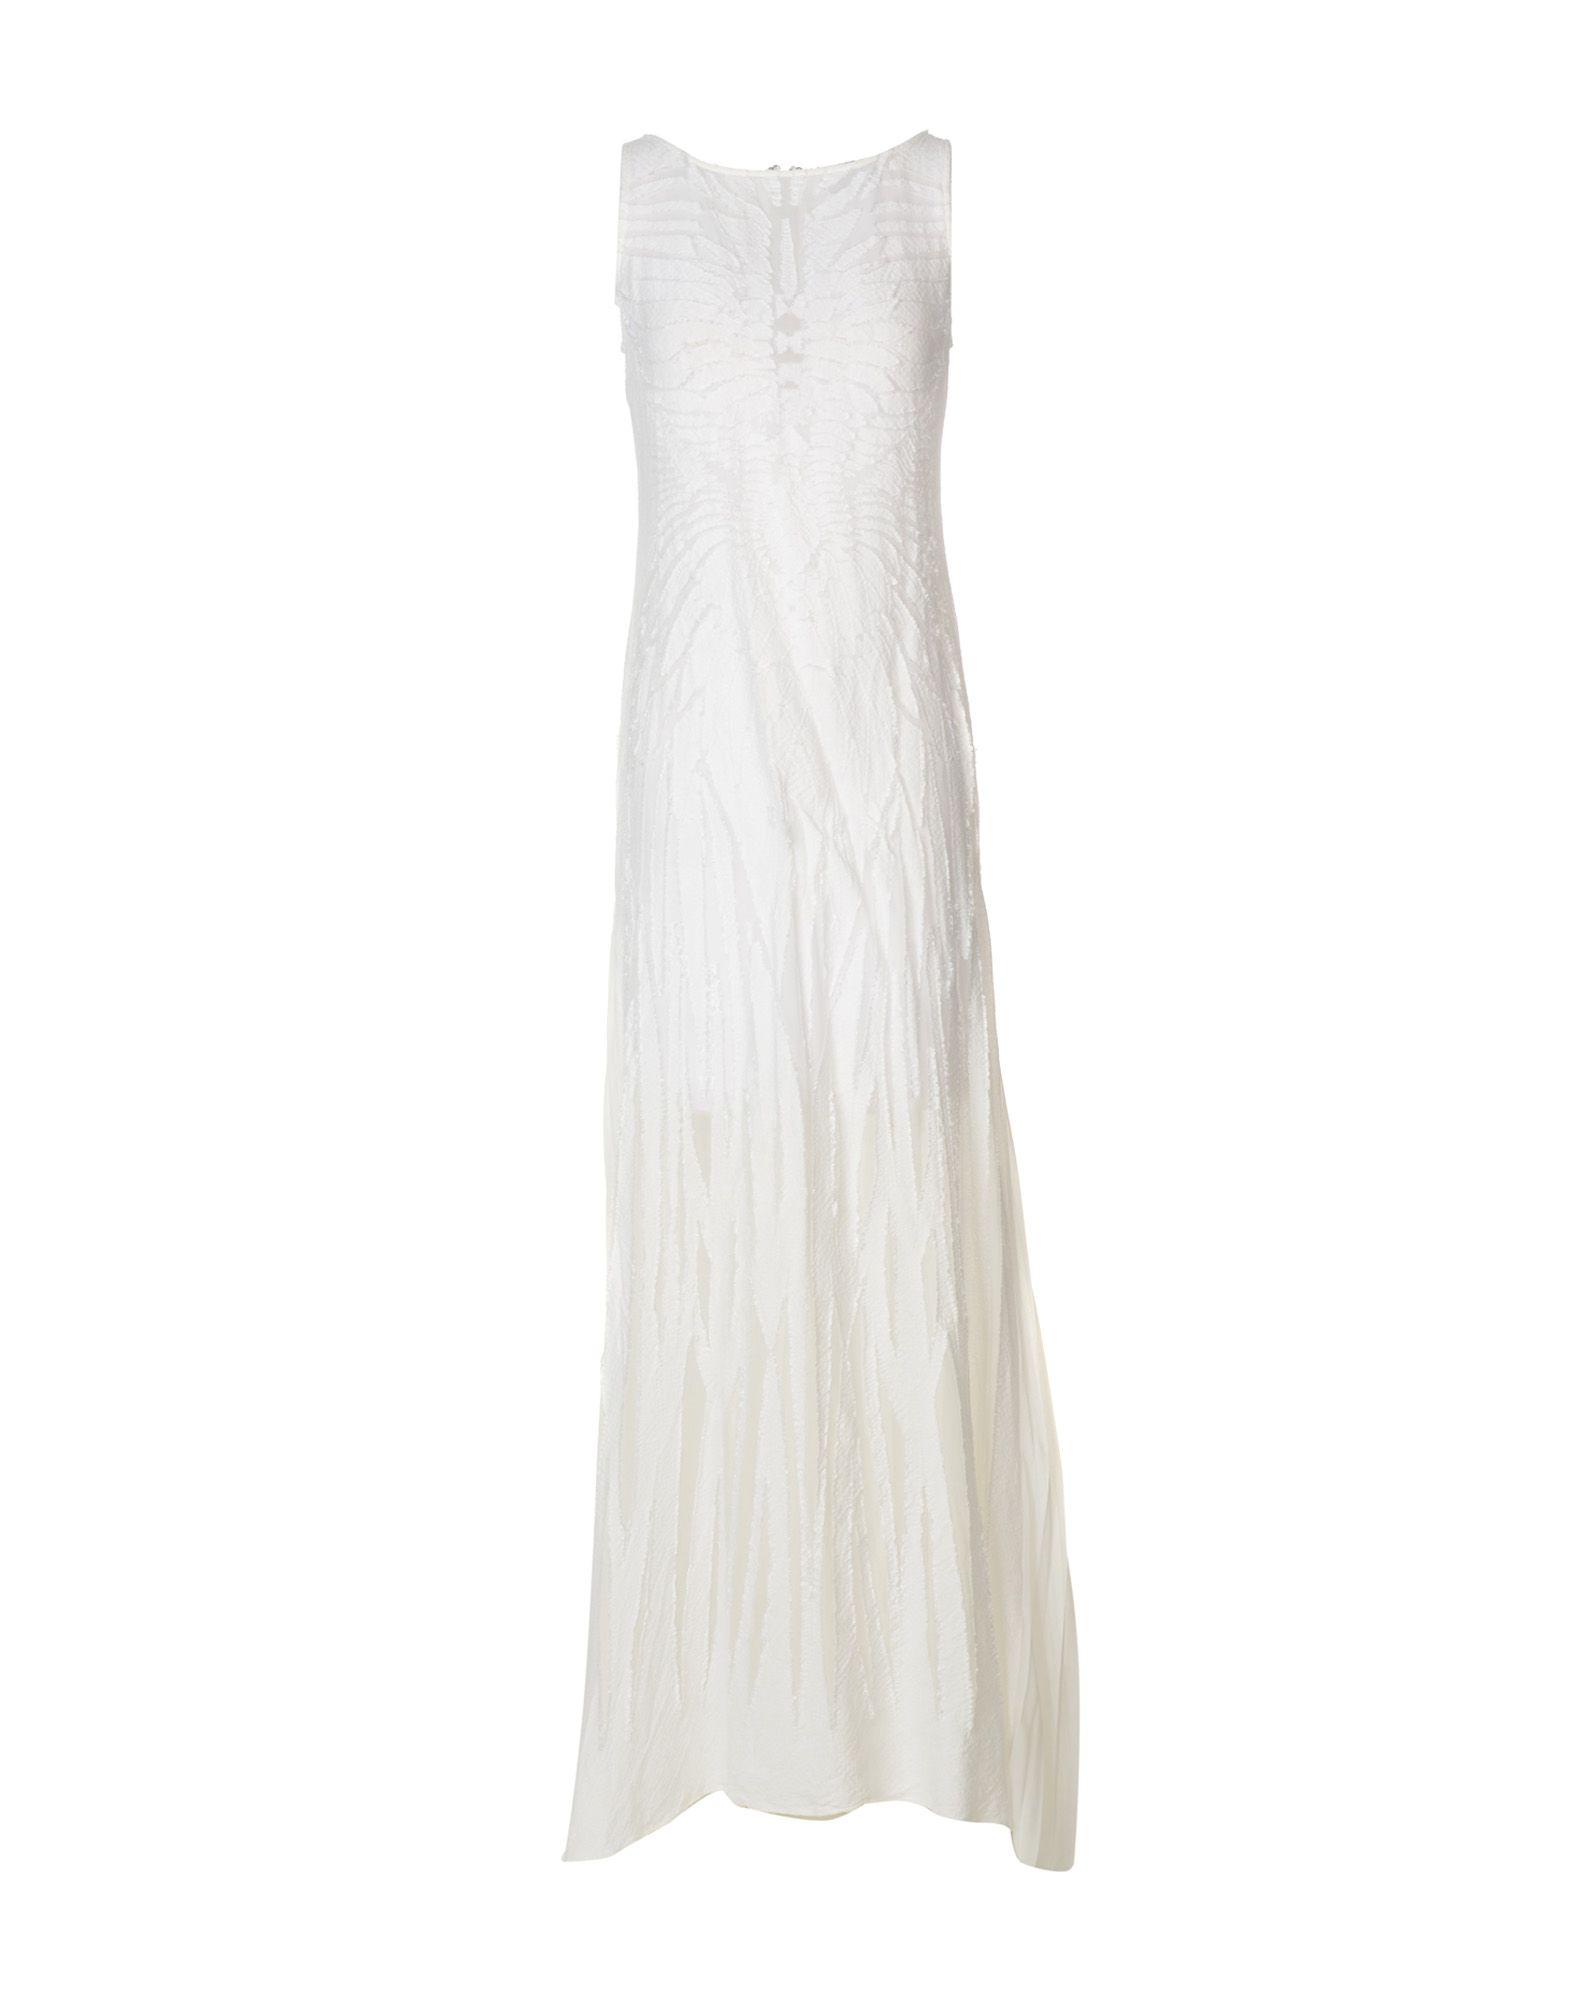 MANUEL FACCHINI Long Dresses in White